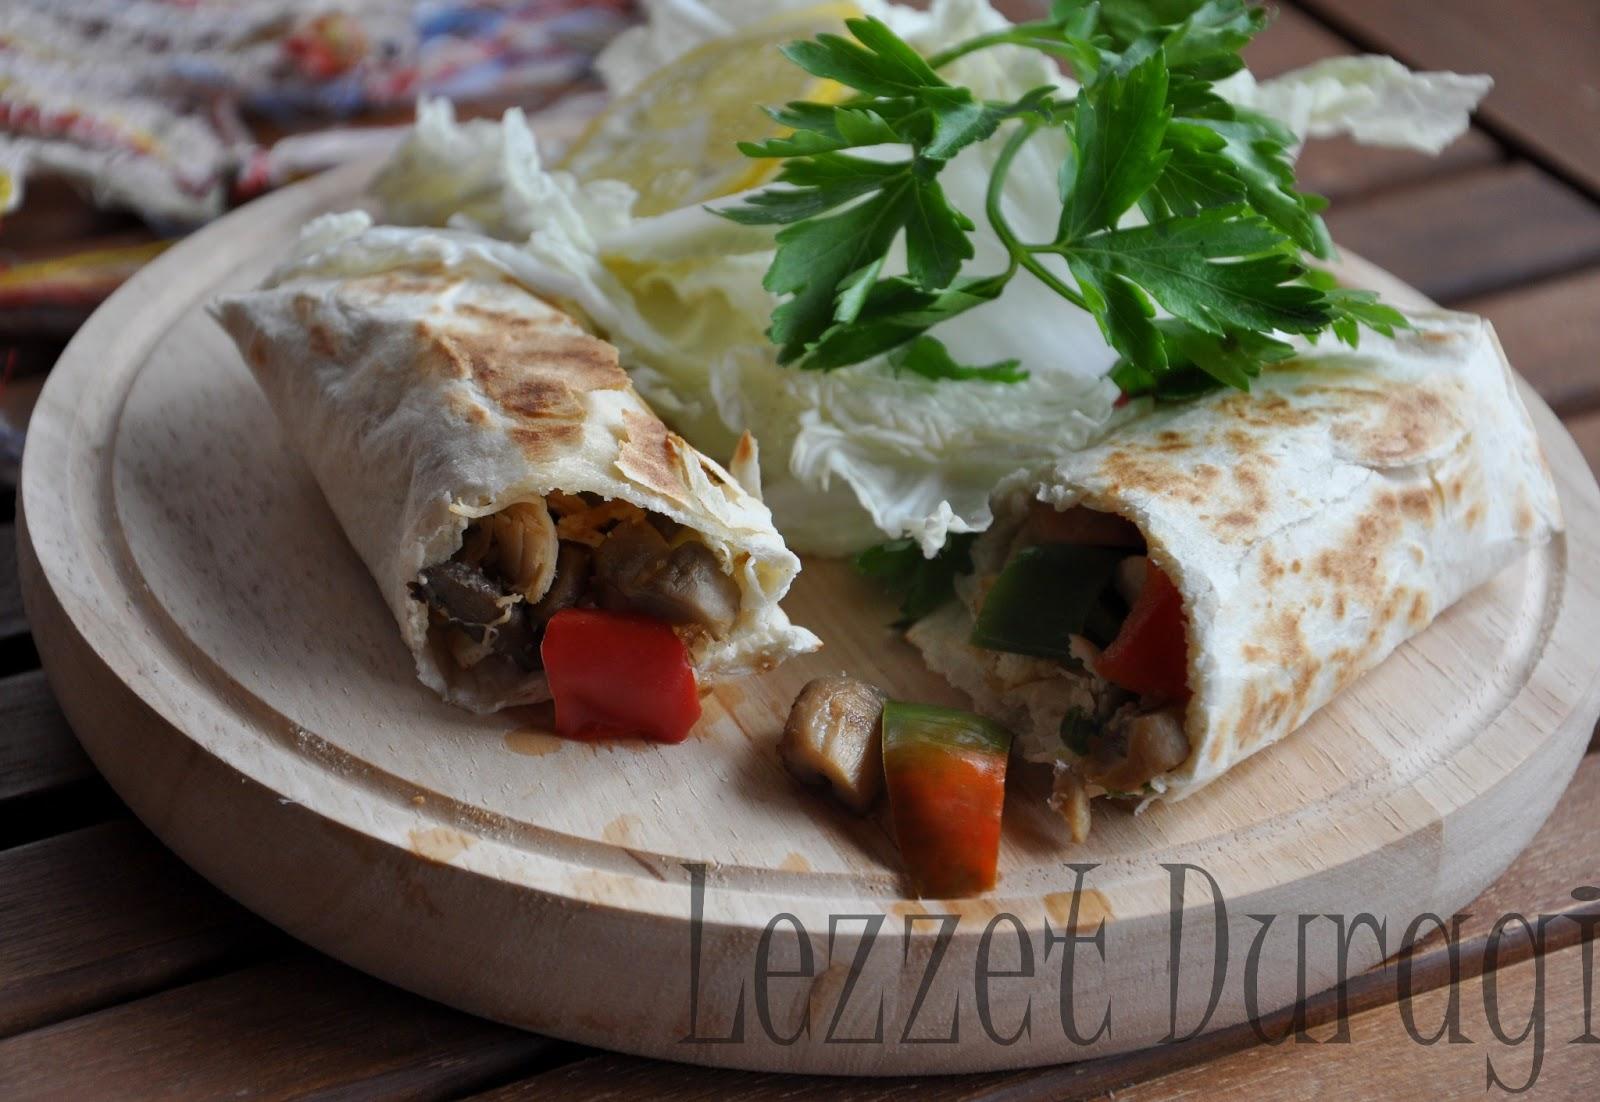 Sebzeli Tavuk Dürüm – Wrap